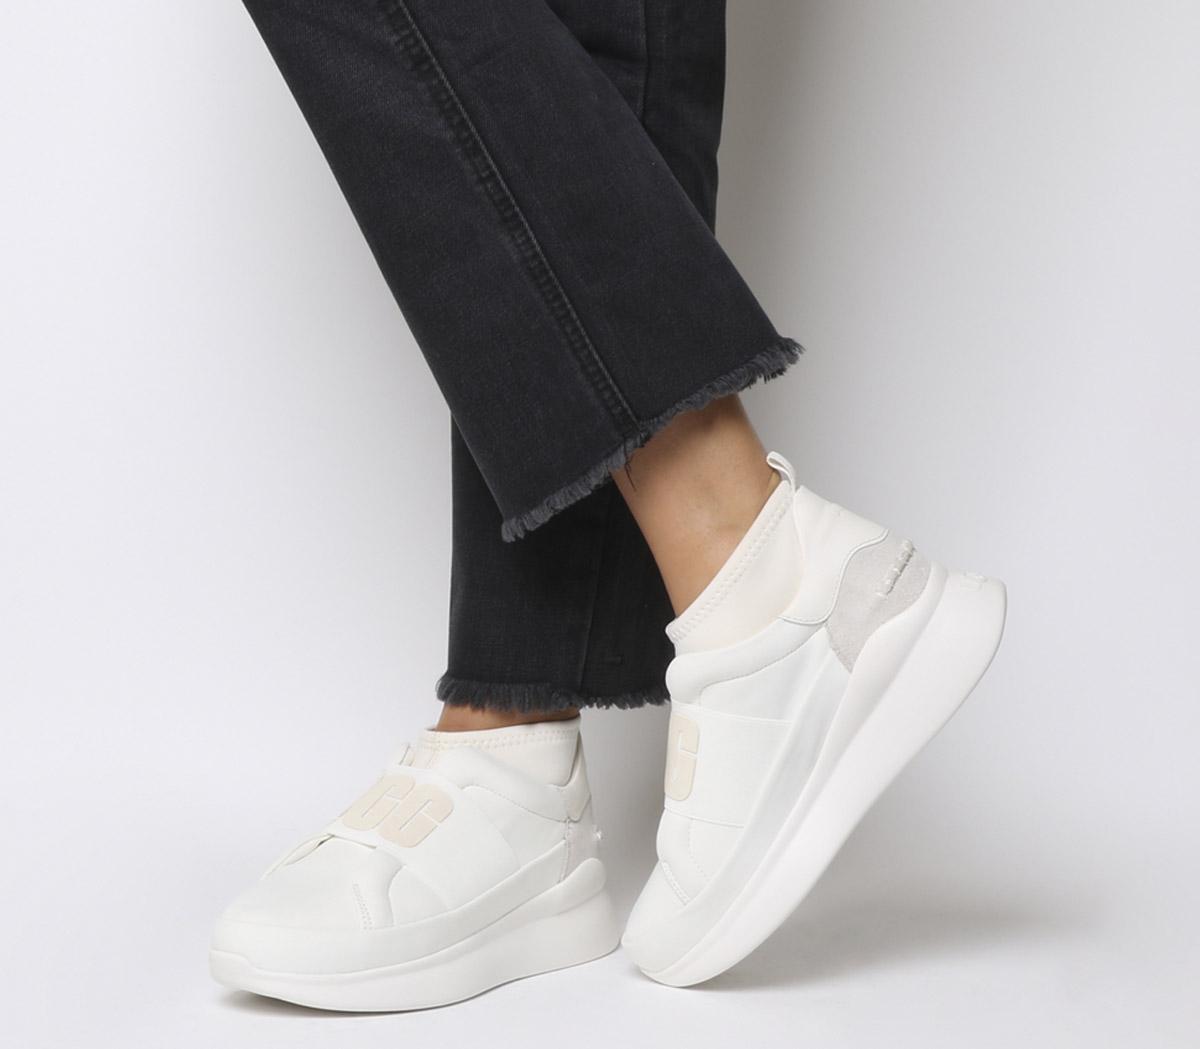 UGG Neutra Sneakers Coconut Milk - Flats